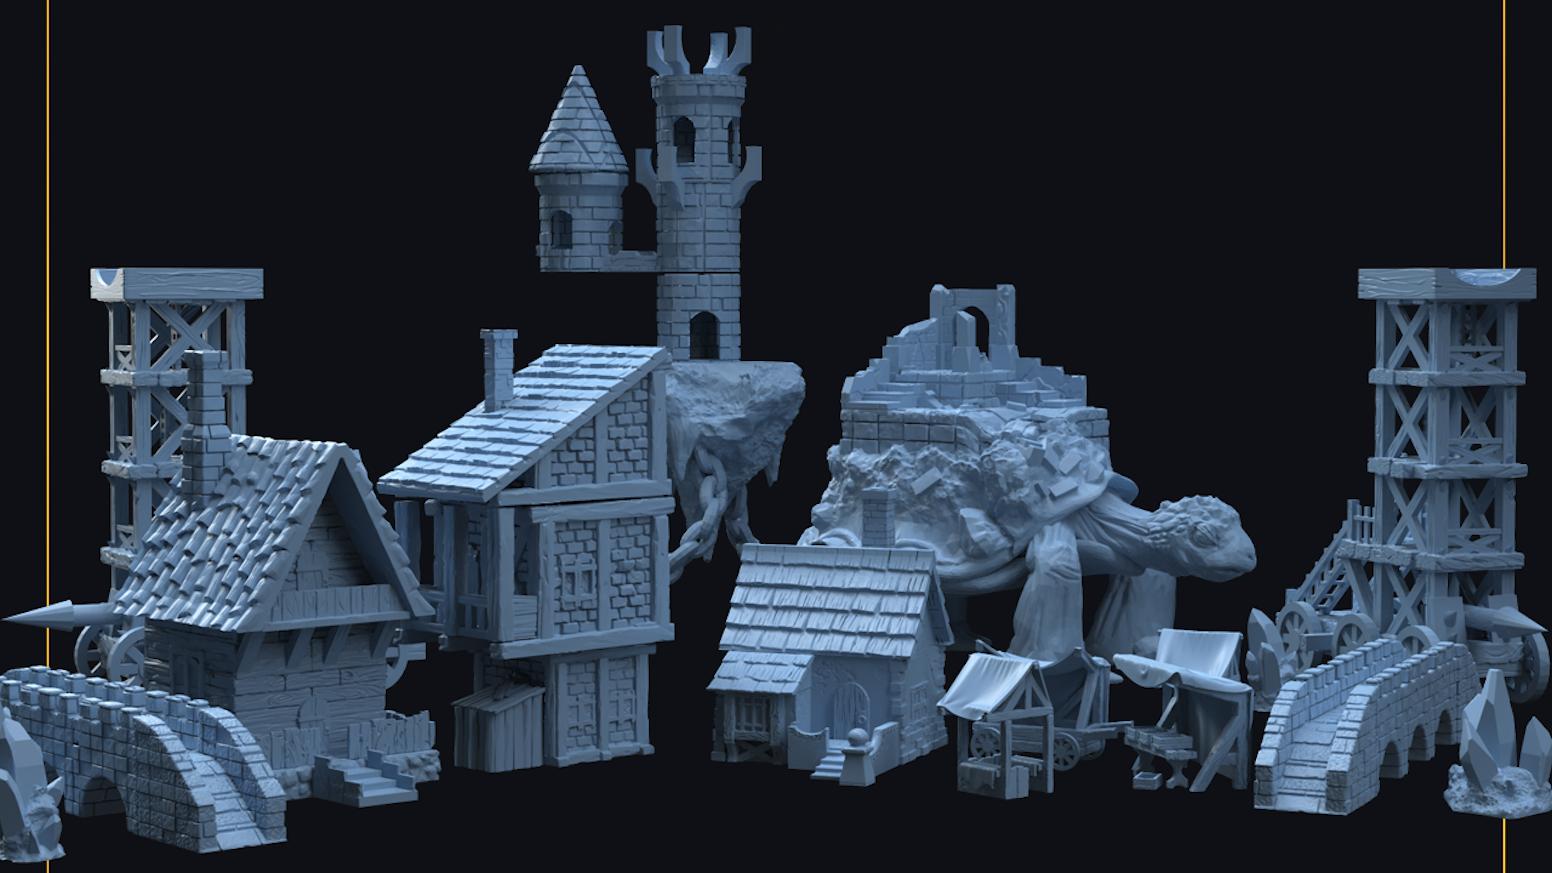 3D Files for print (STL)